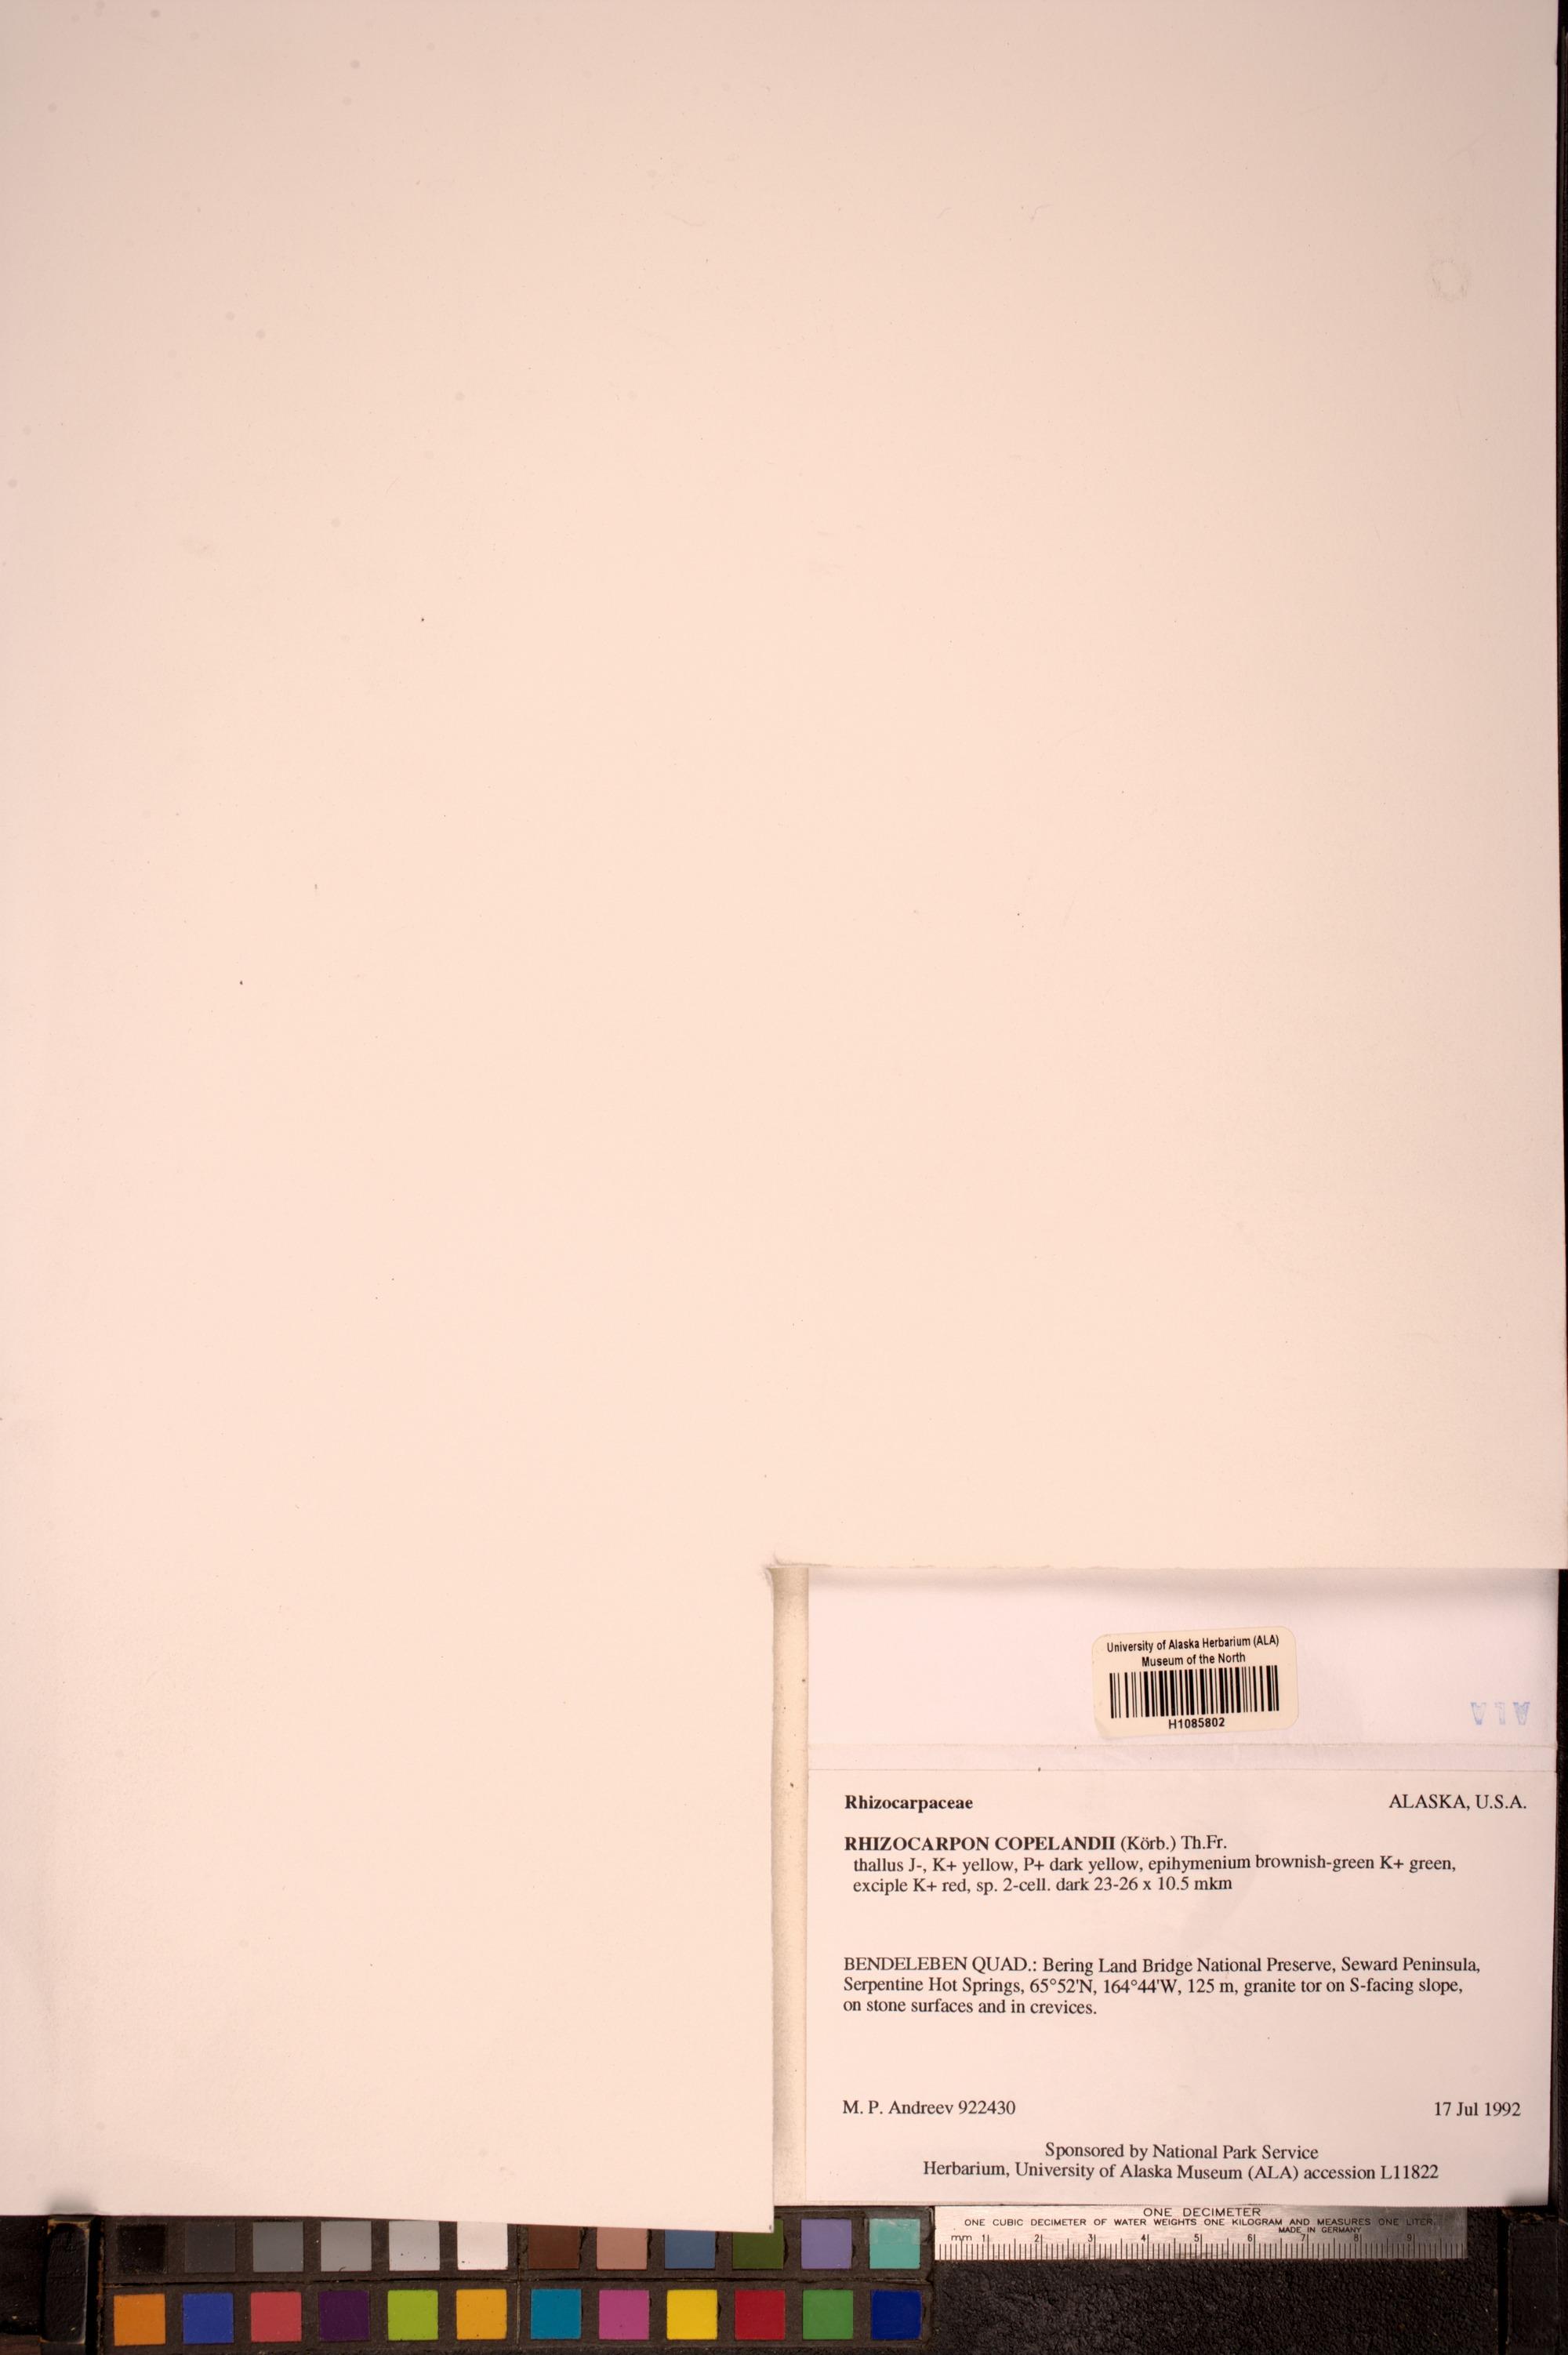 Rhizocarpon copelandii image